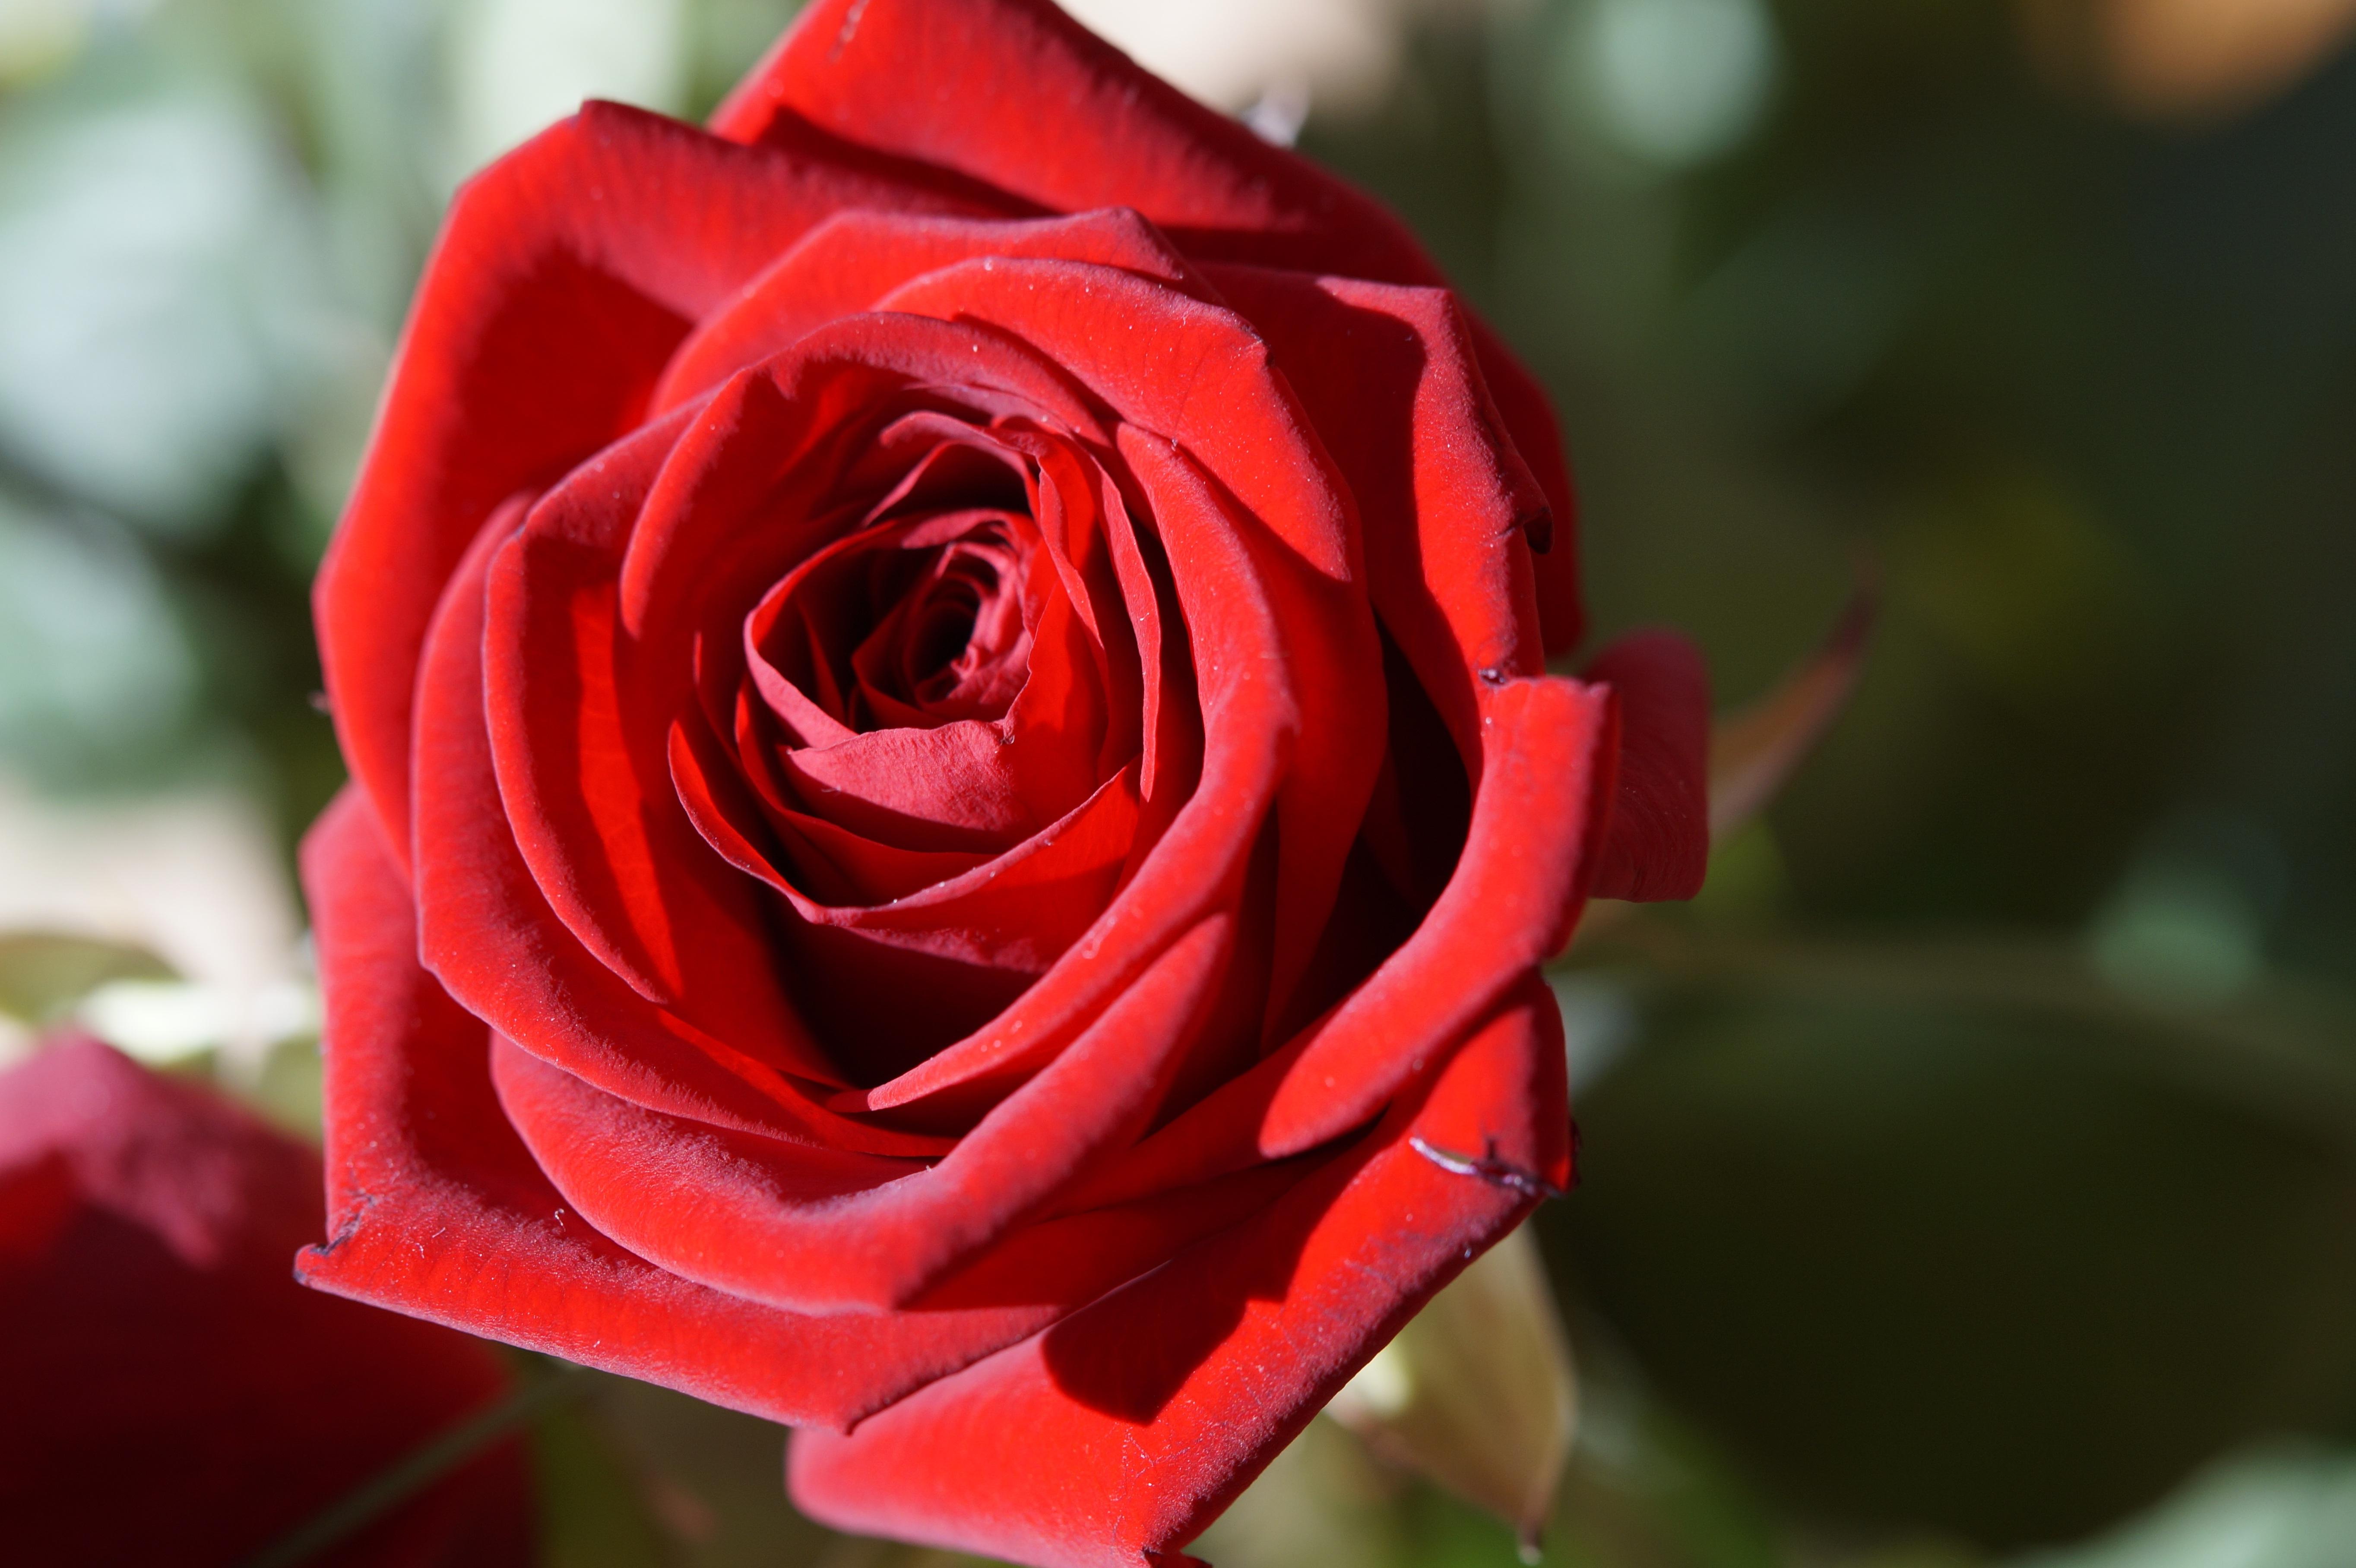 Gambar menanam daun bunga berkembang percintaan romantis berwarna merah muda mawar merah hari pernikahan merapatkan floribunda naik mekar